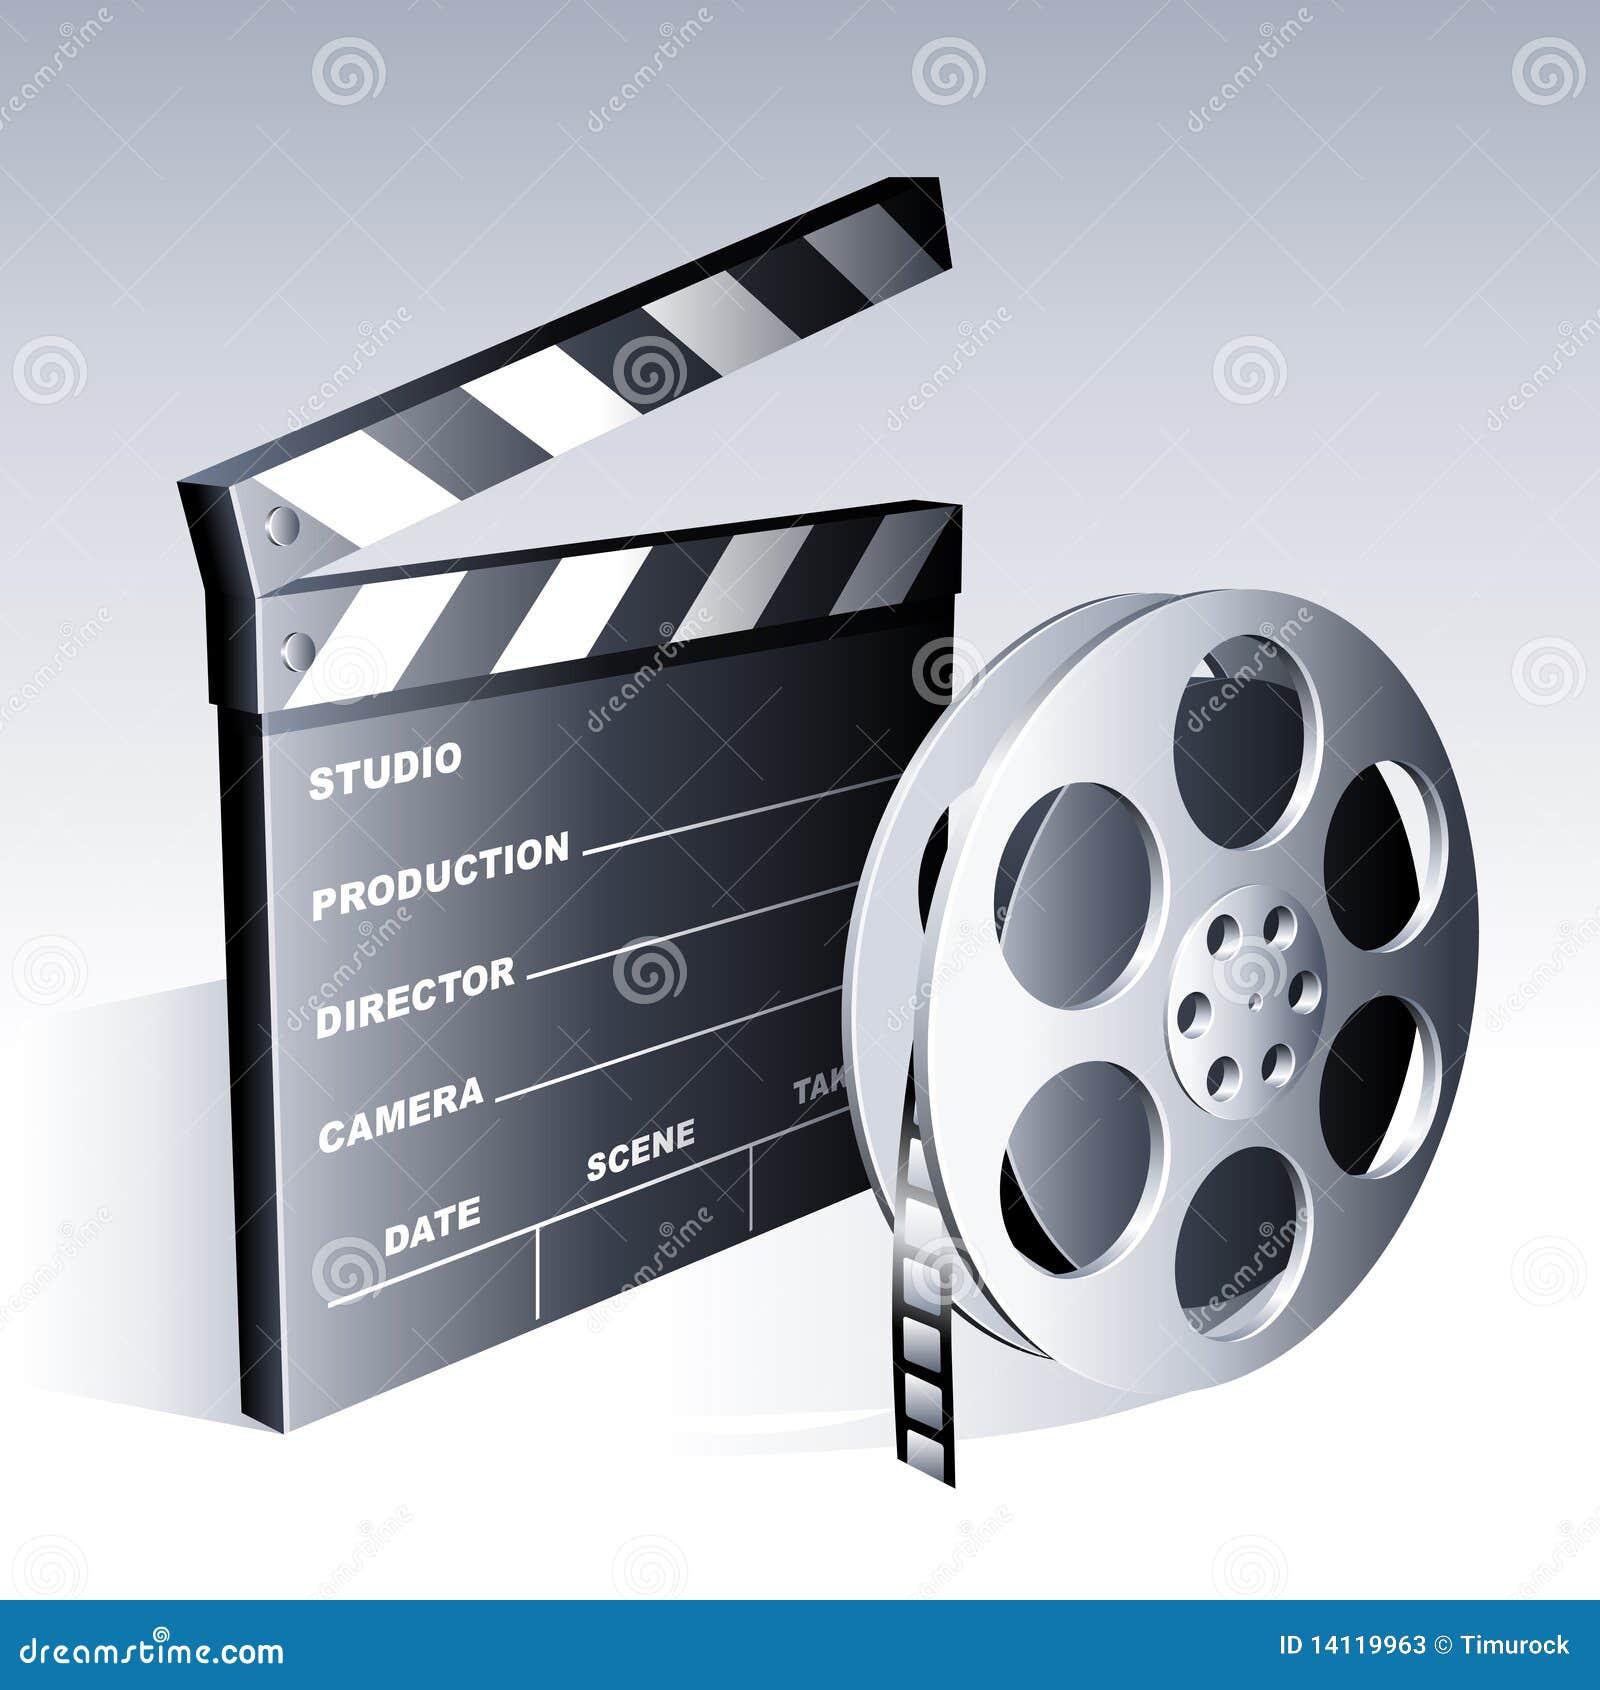 Movie symbols stock vector illustration of equipment 14119963 movie symbols biocorpaavc